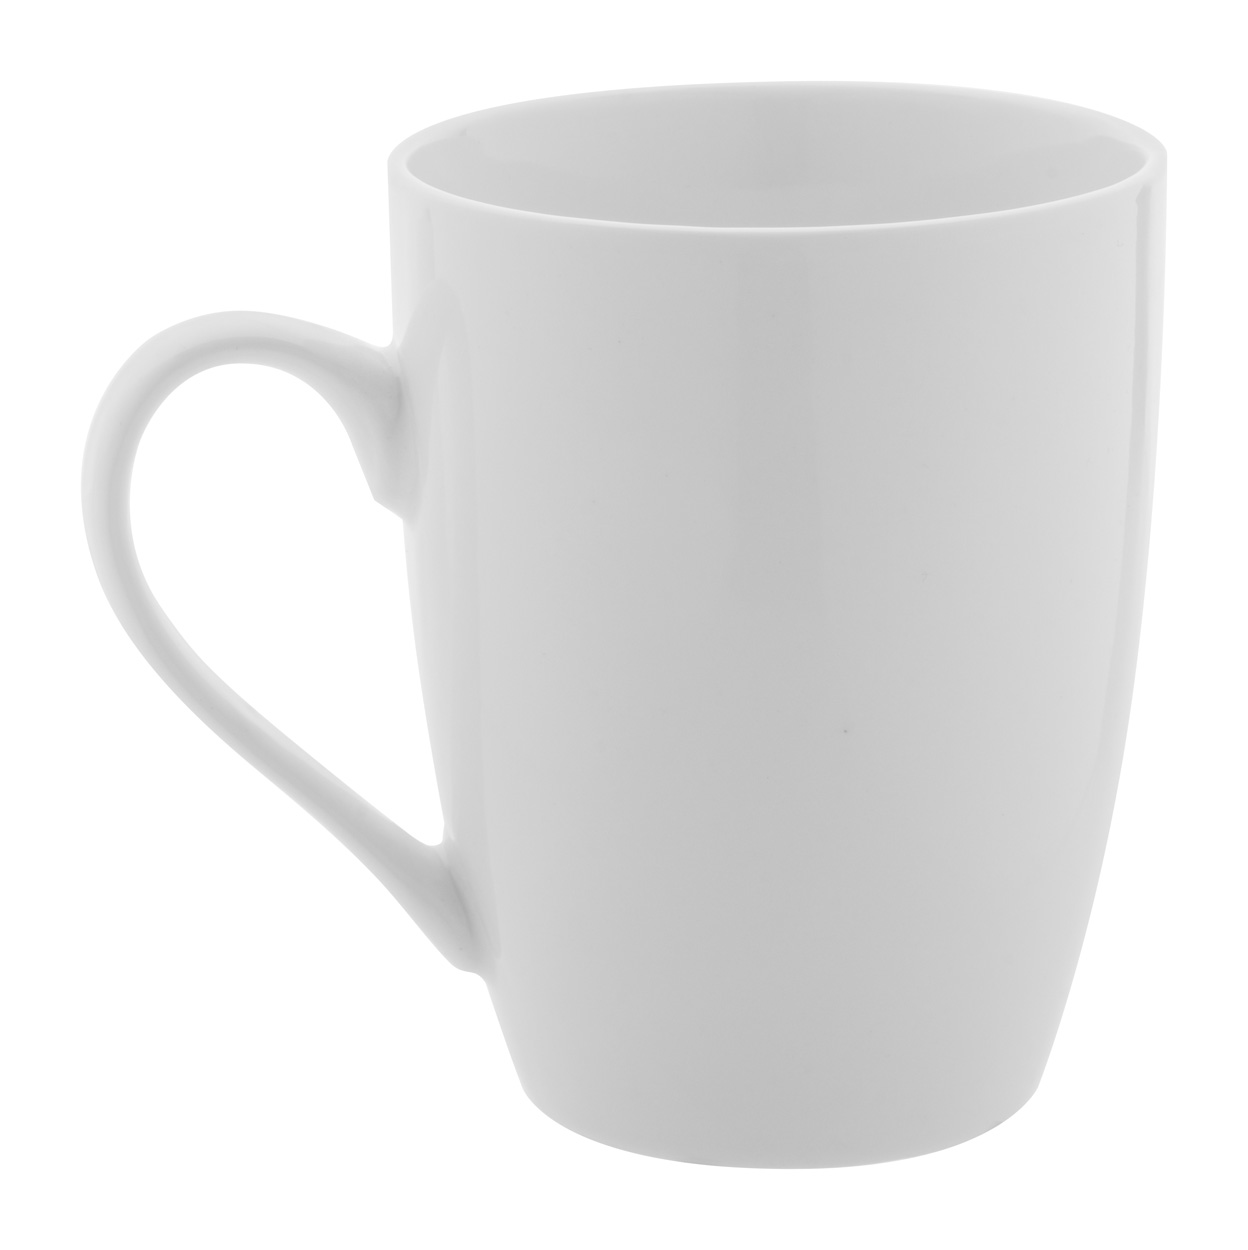 Artemis tazza di porcellana